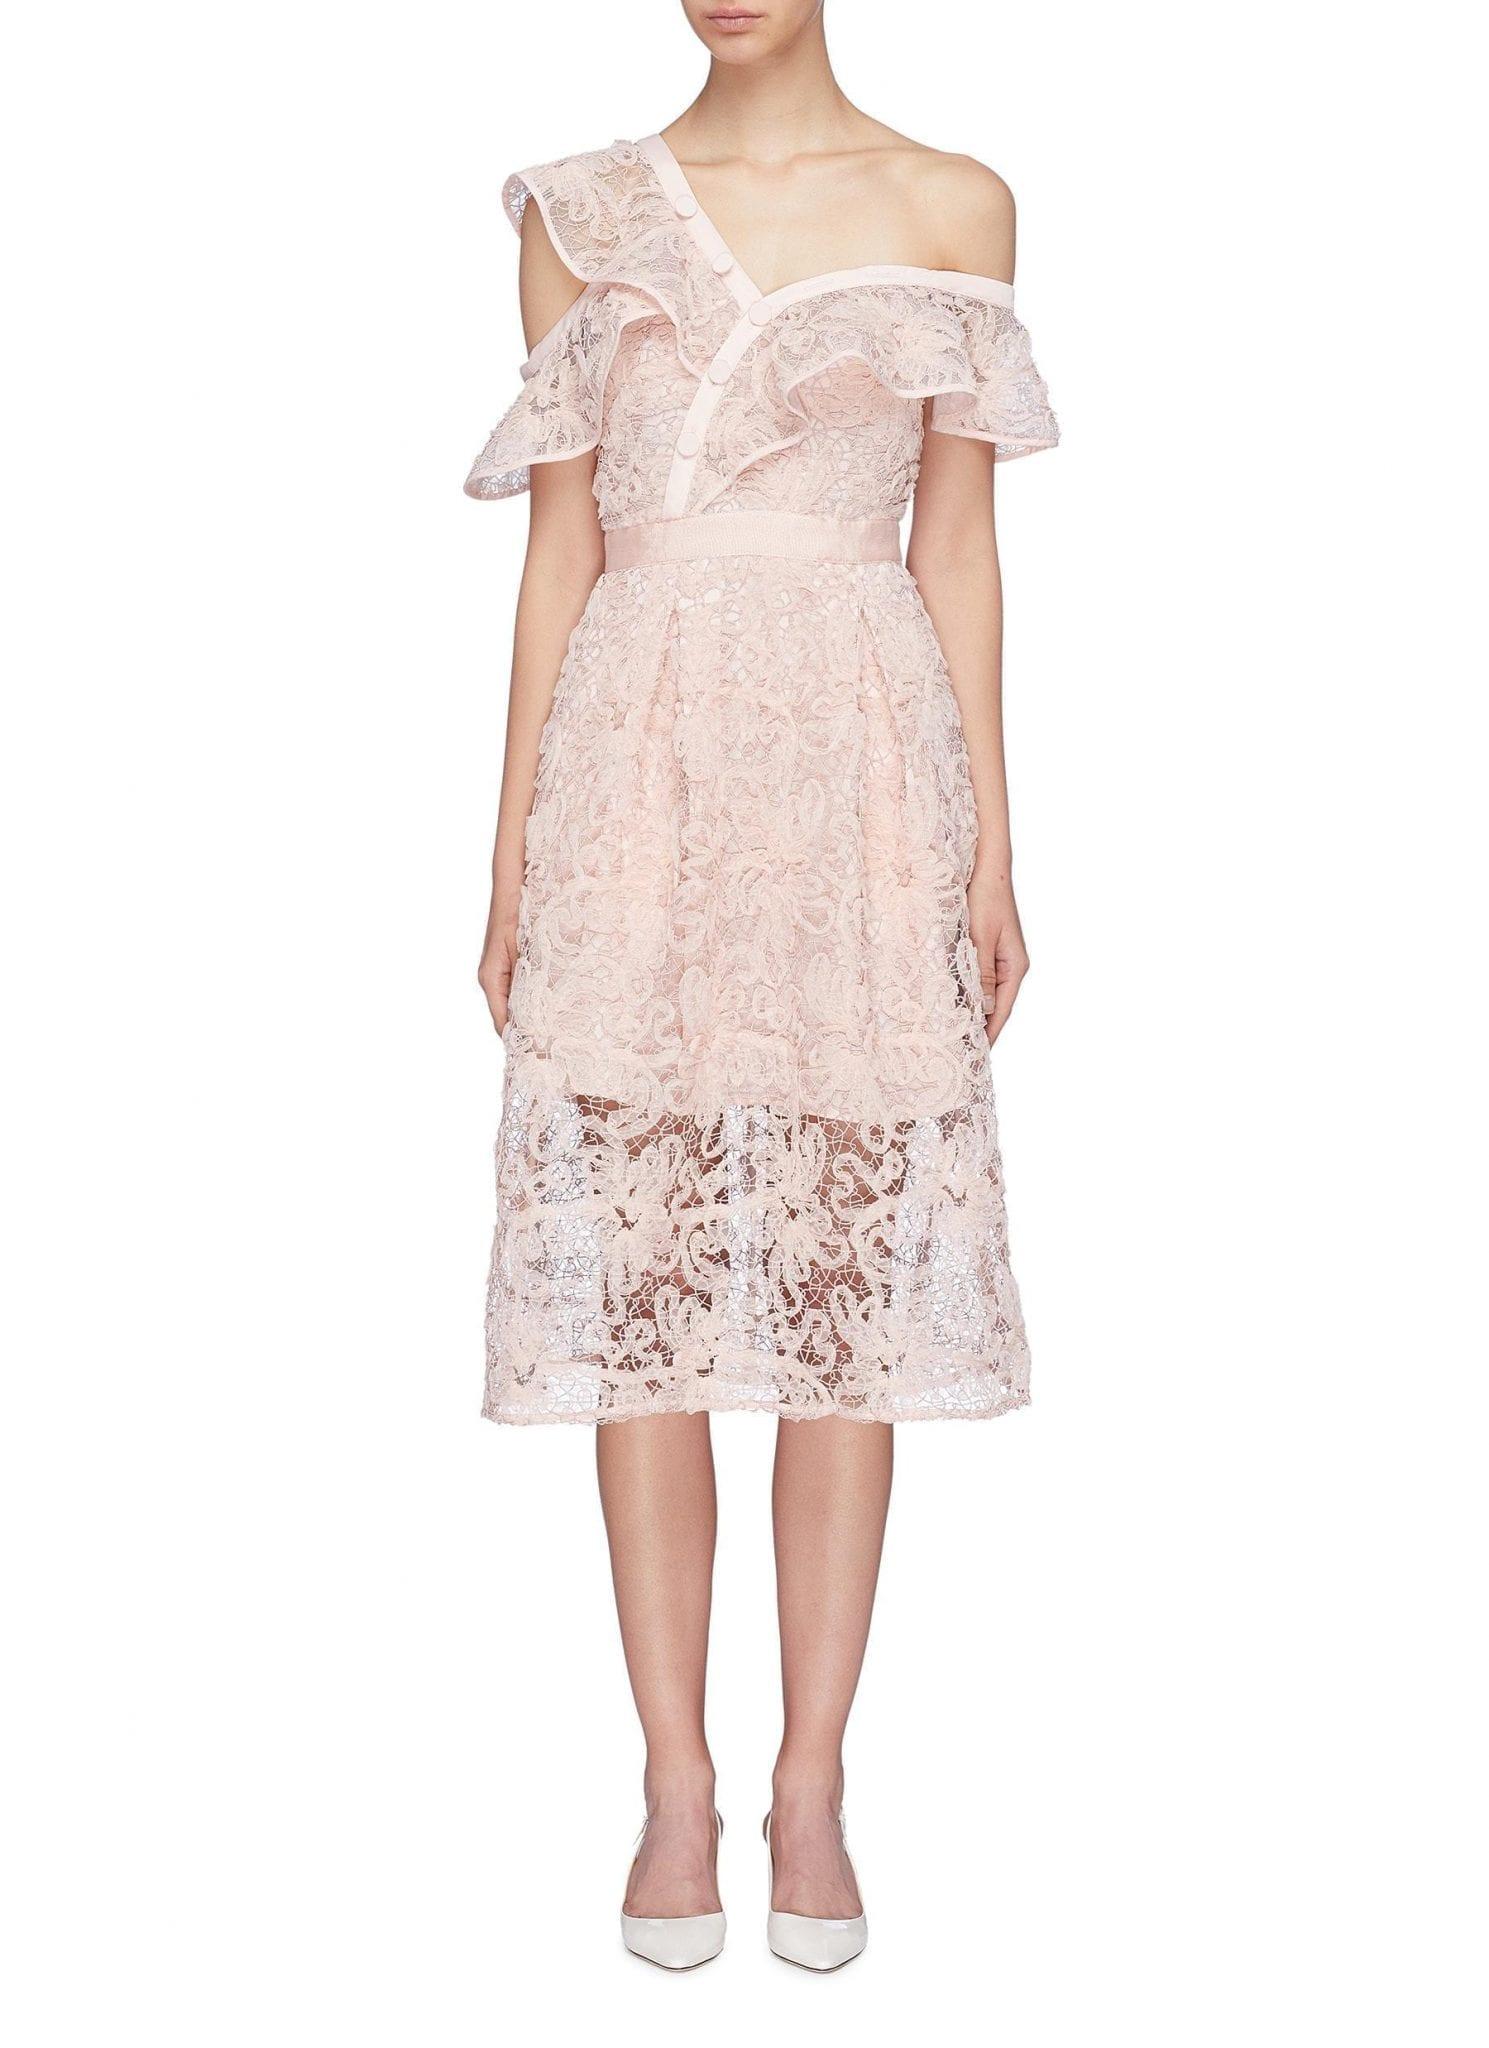 fb836e8b4ac9 SELF-PORTRAIT Asymmetric Ruffle One-shoulder Floral Mesh Lace Light Pink  Dress